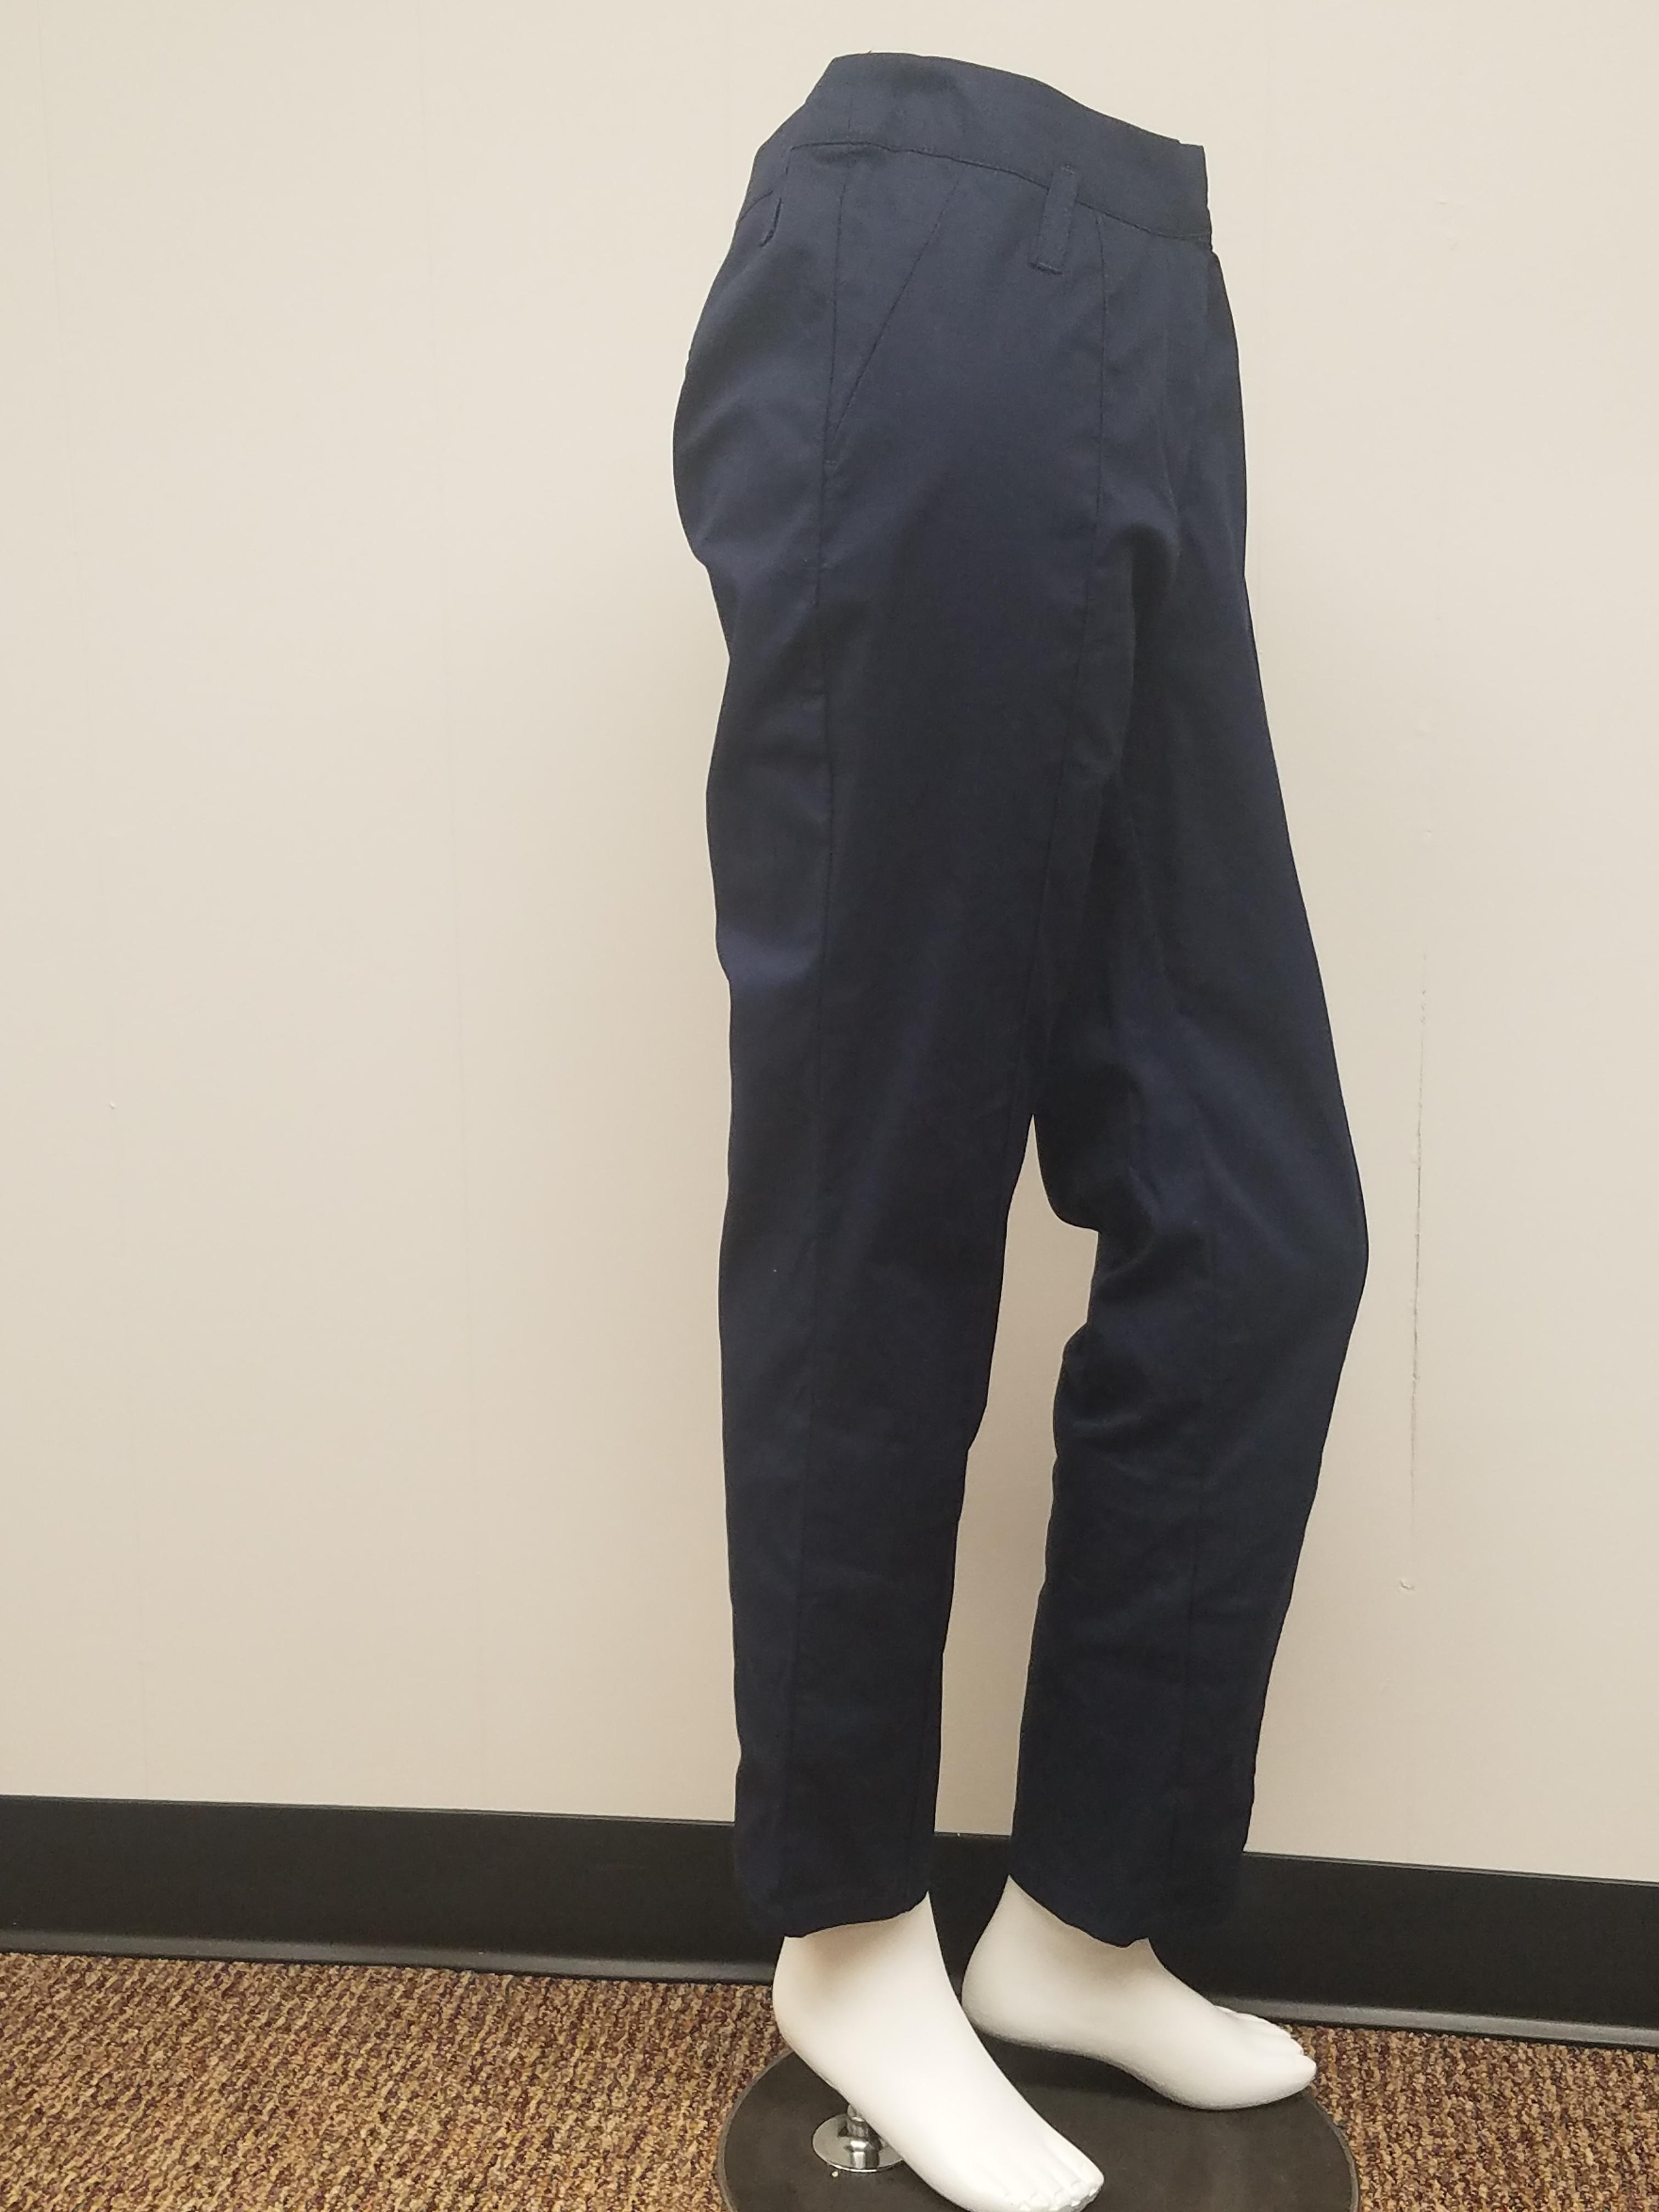 Boss Lady Navy Blue Dress Slacks